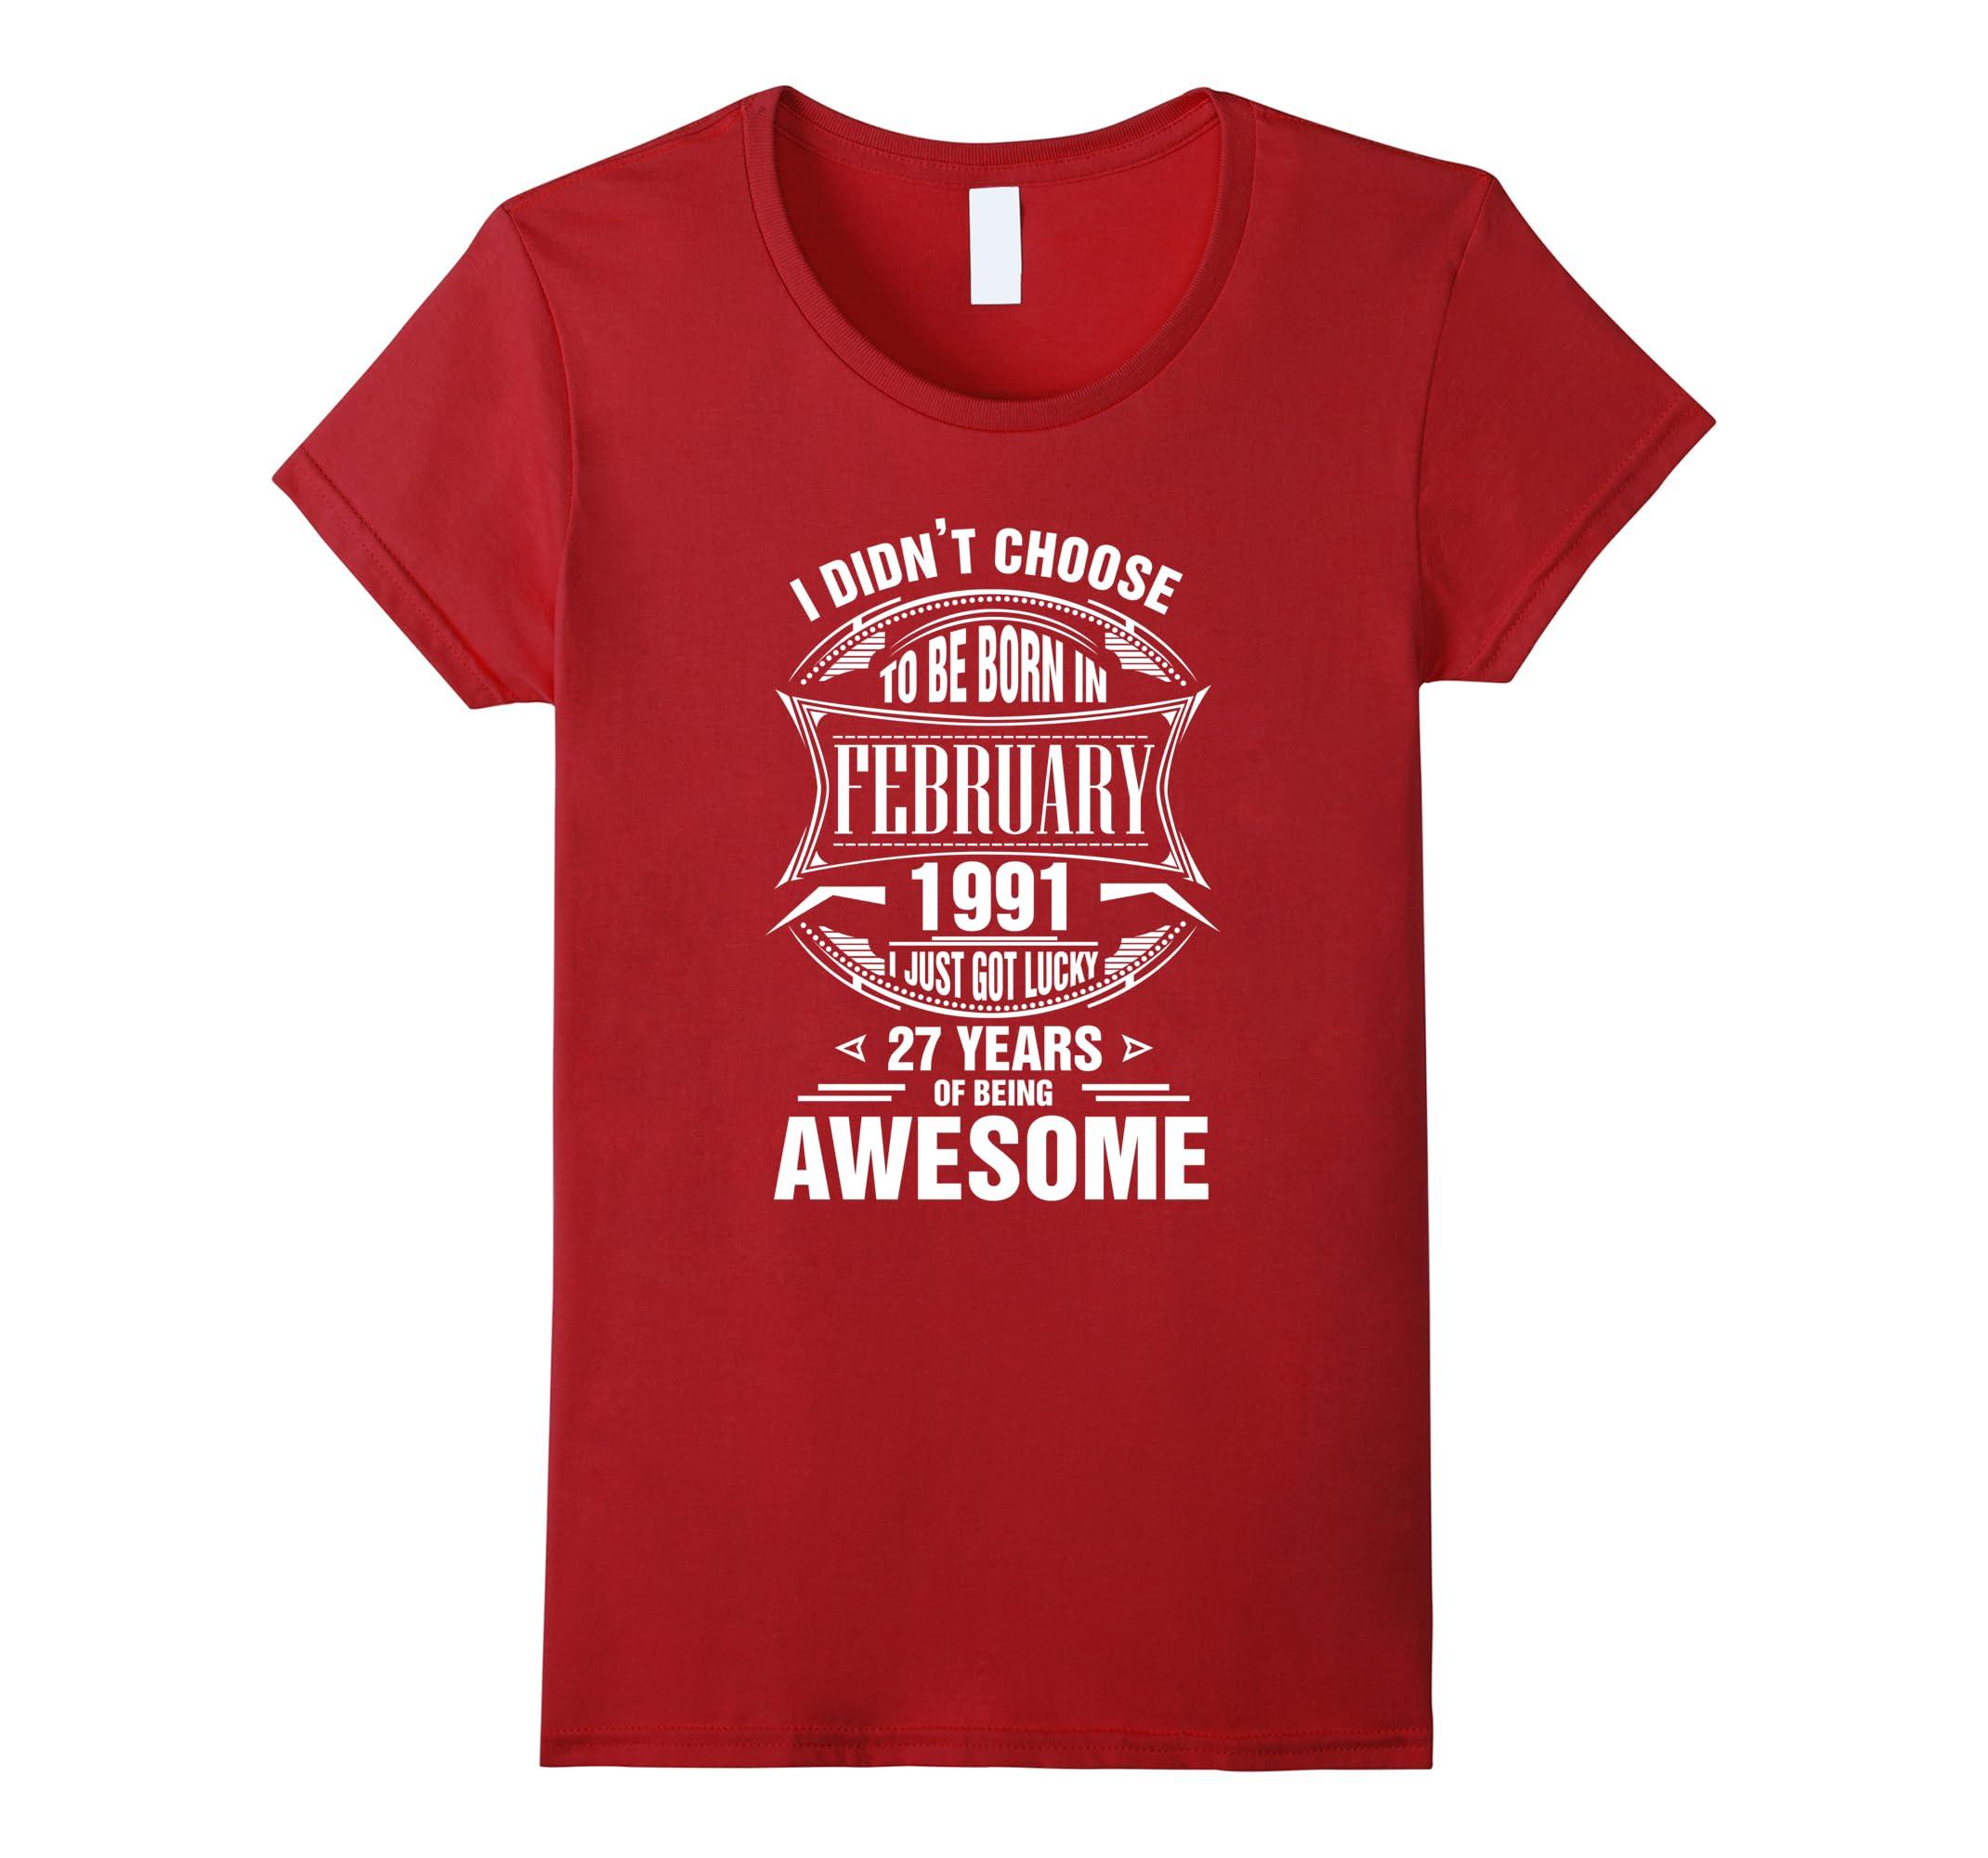 choose February shirt Cool Tee-Newstyleth